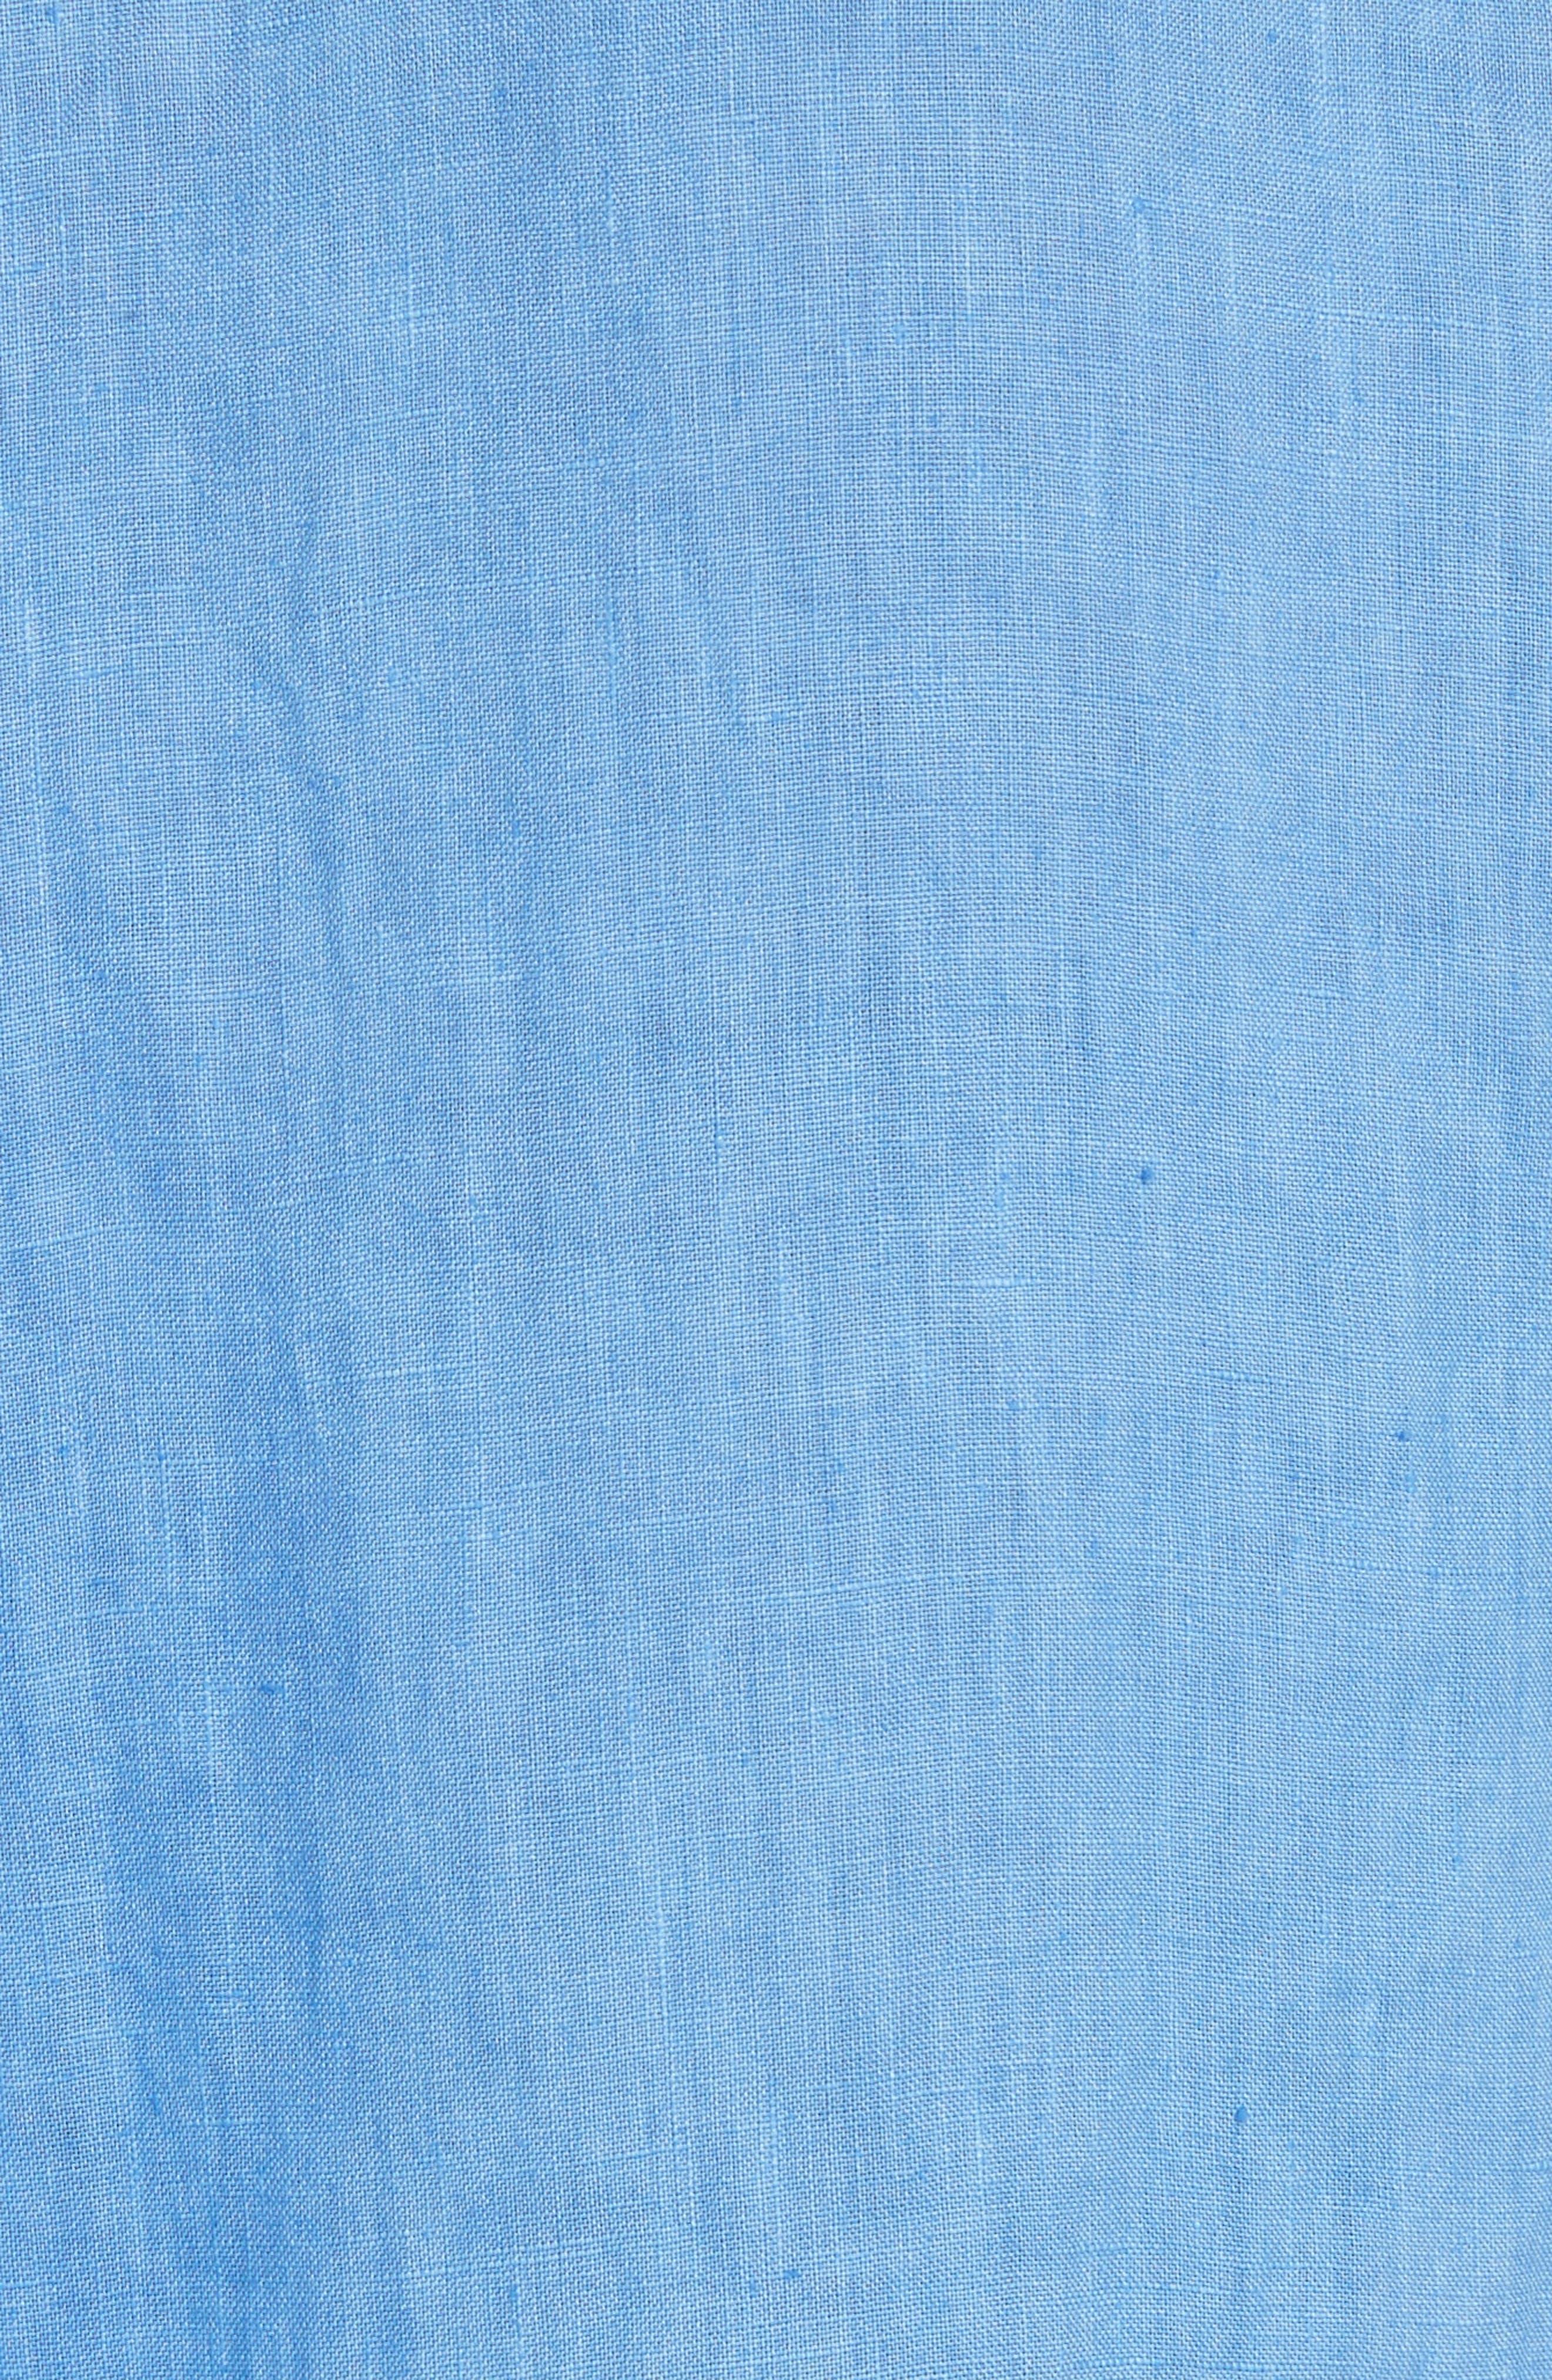 Short Sleeve Woven Linen Shirt,                             Alternate thumbnail 5, color,                             Blue